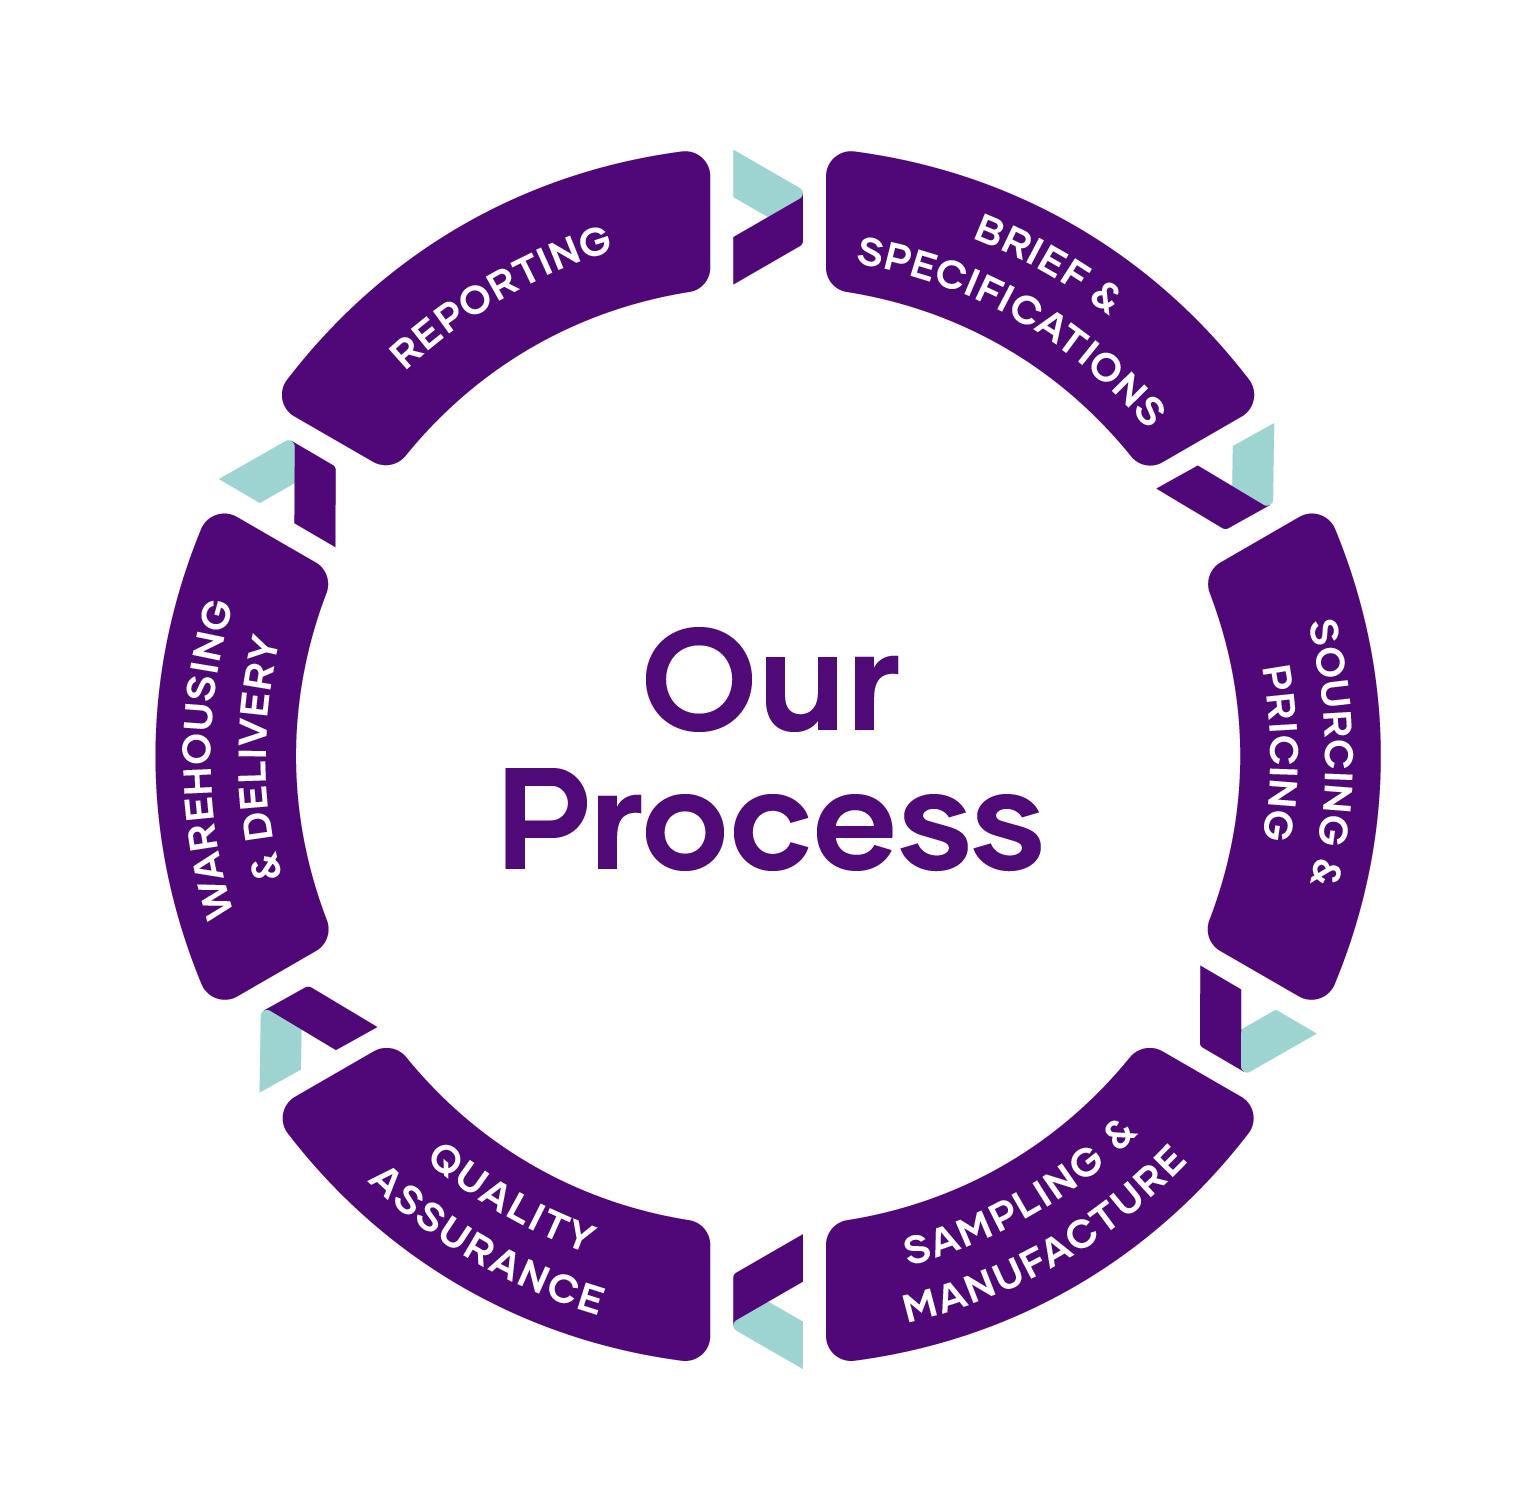 The Hi-Tech Packaging 6 Step Process